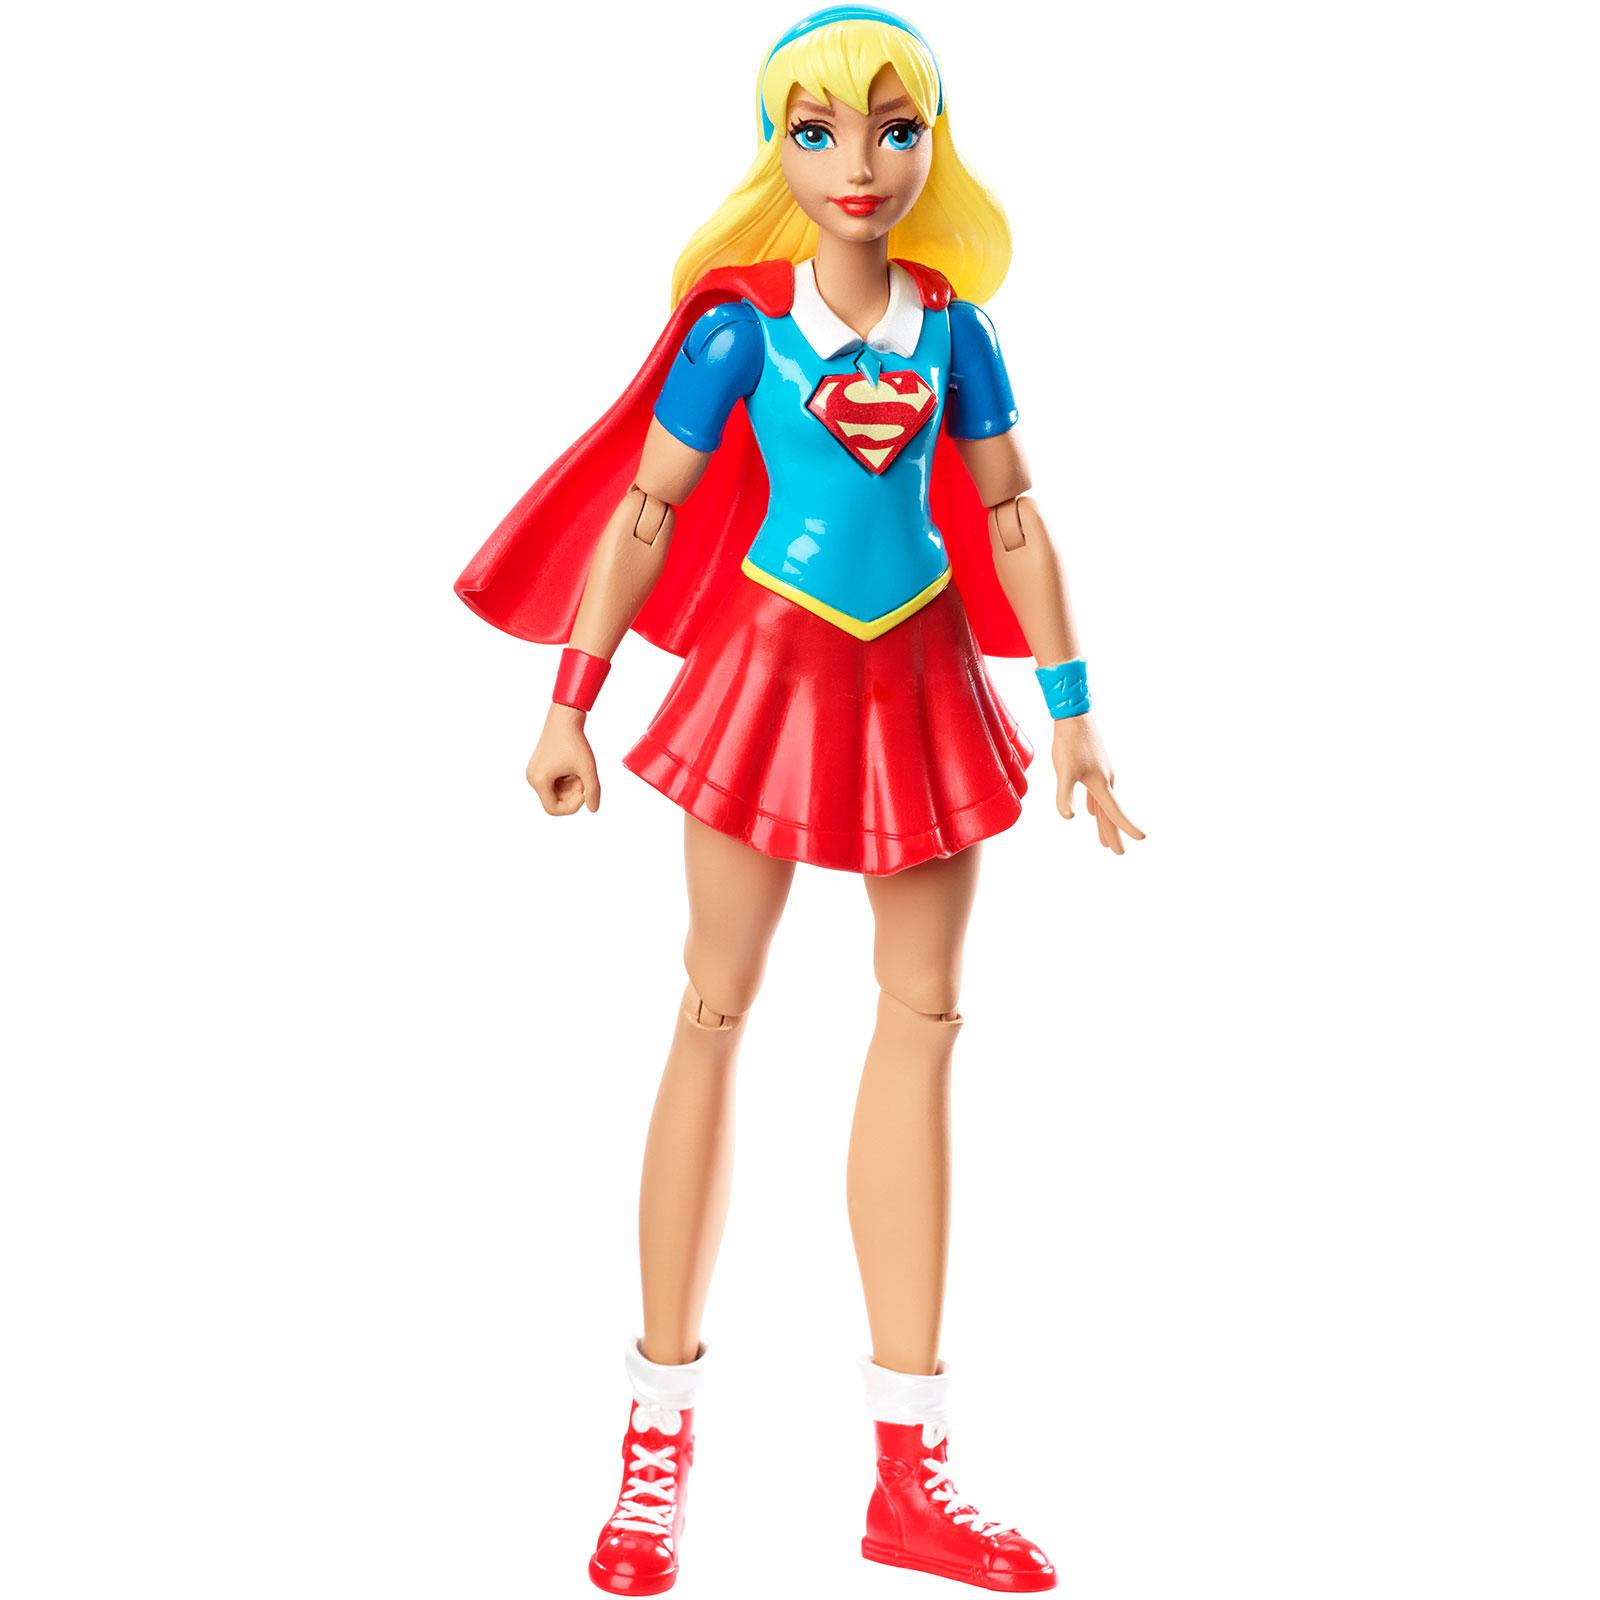 "DC Comics Super Hero Girls - Super Girl 6"" Action Figure PartNumber: 004W009105302002P KsnValue: 004W009105302002 MfgPartNumber: DMM32"